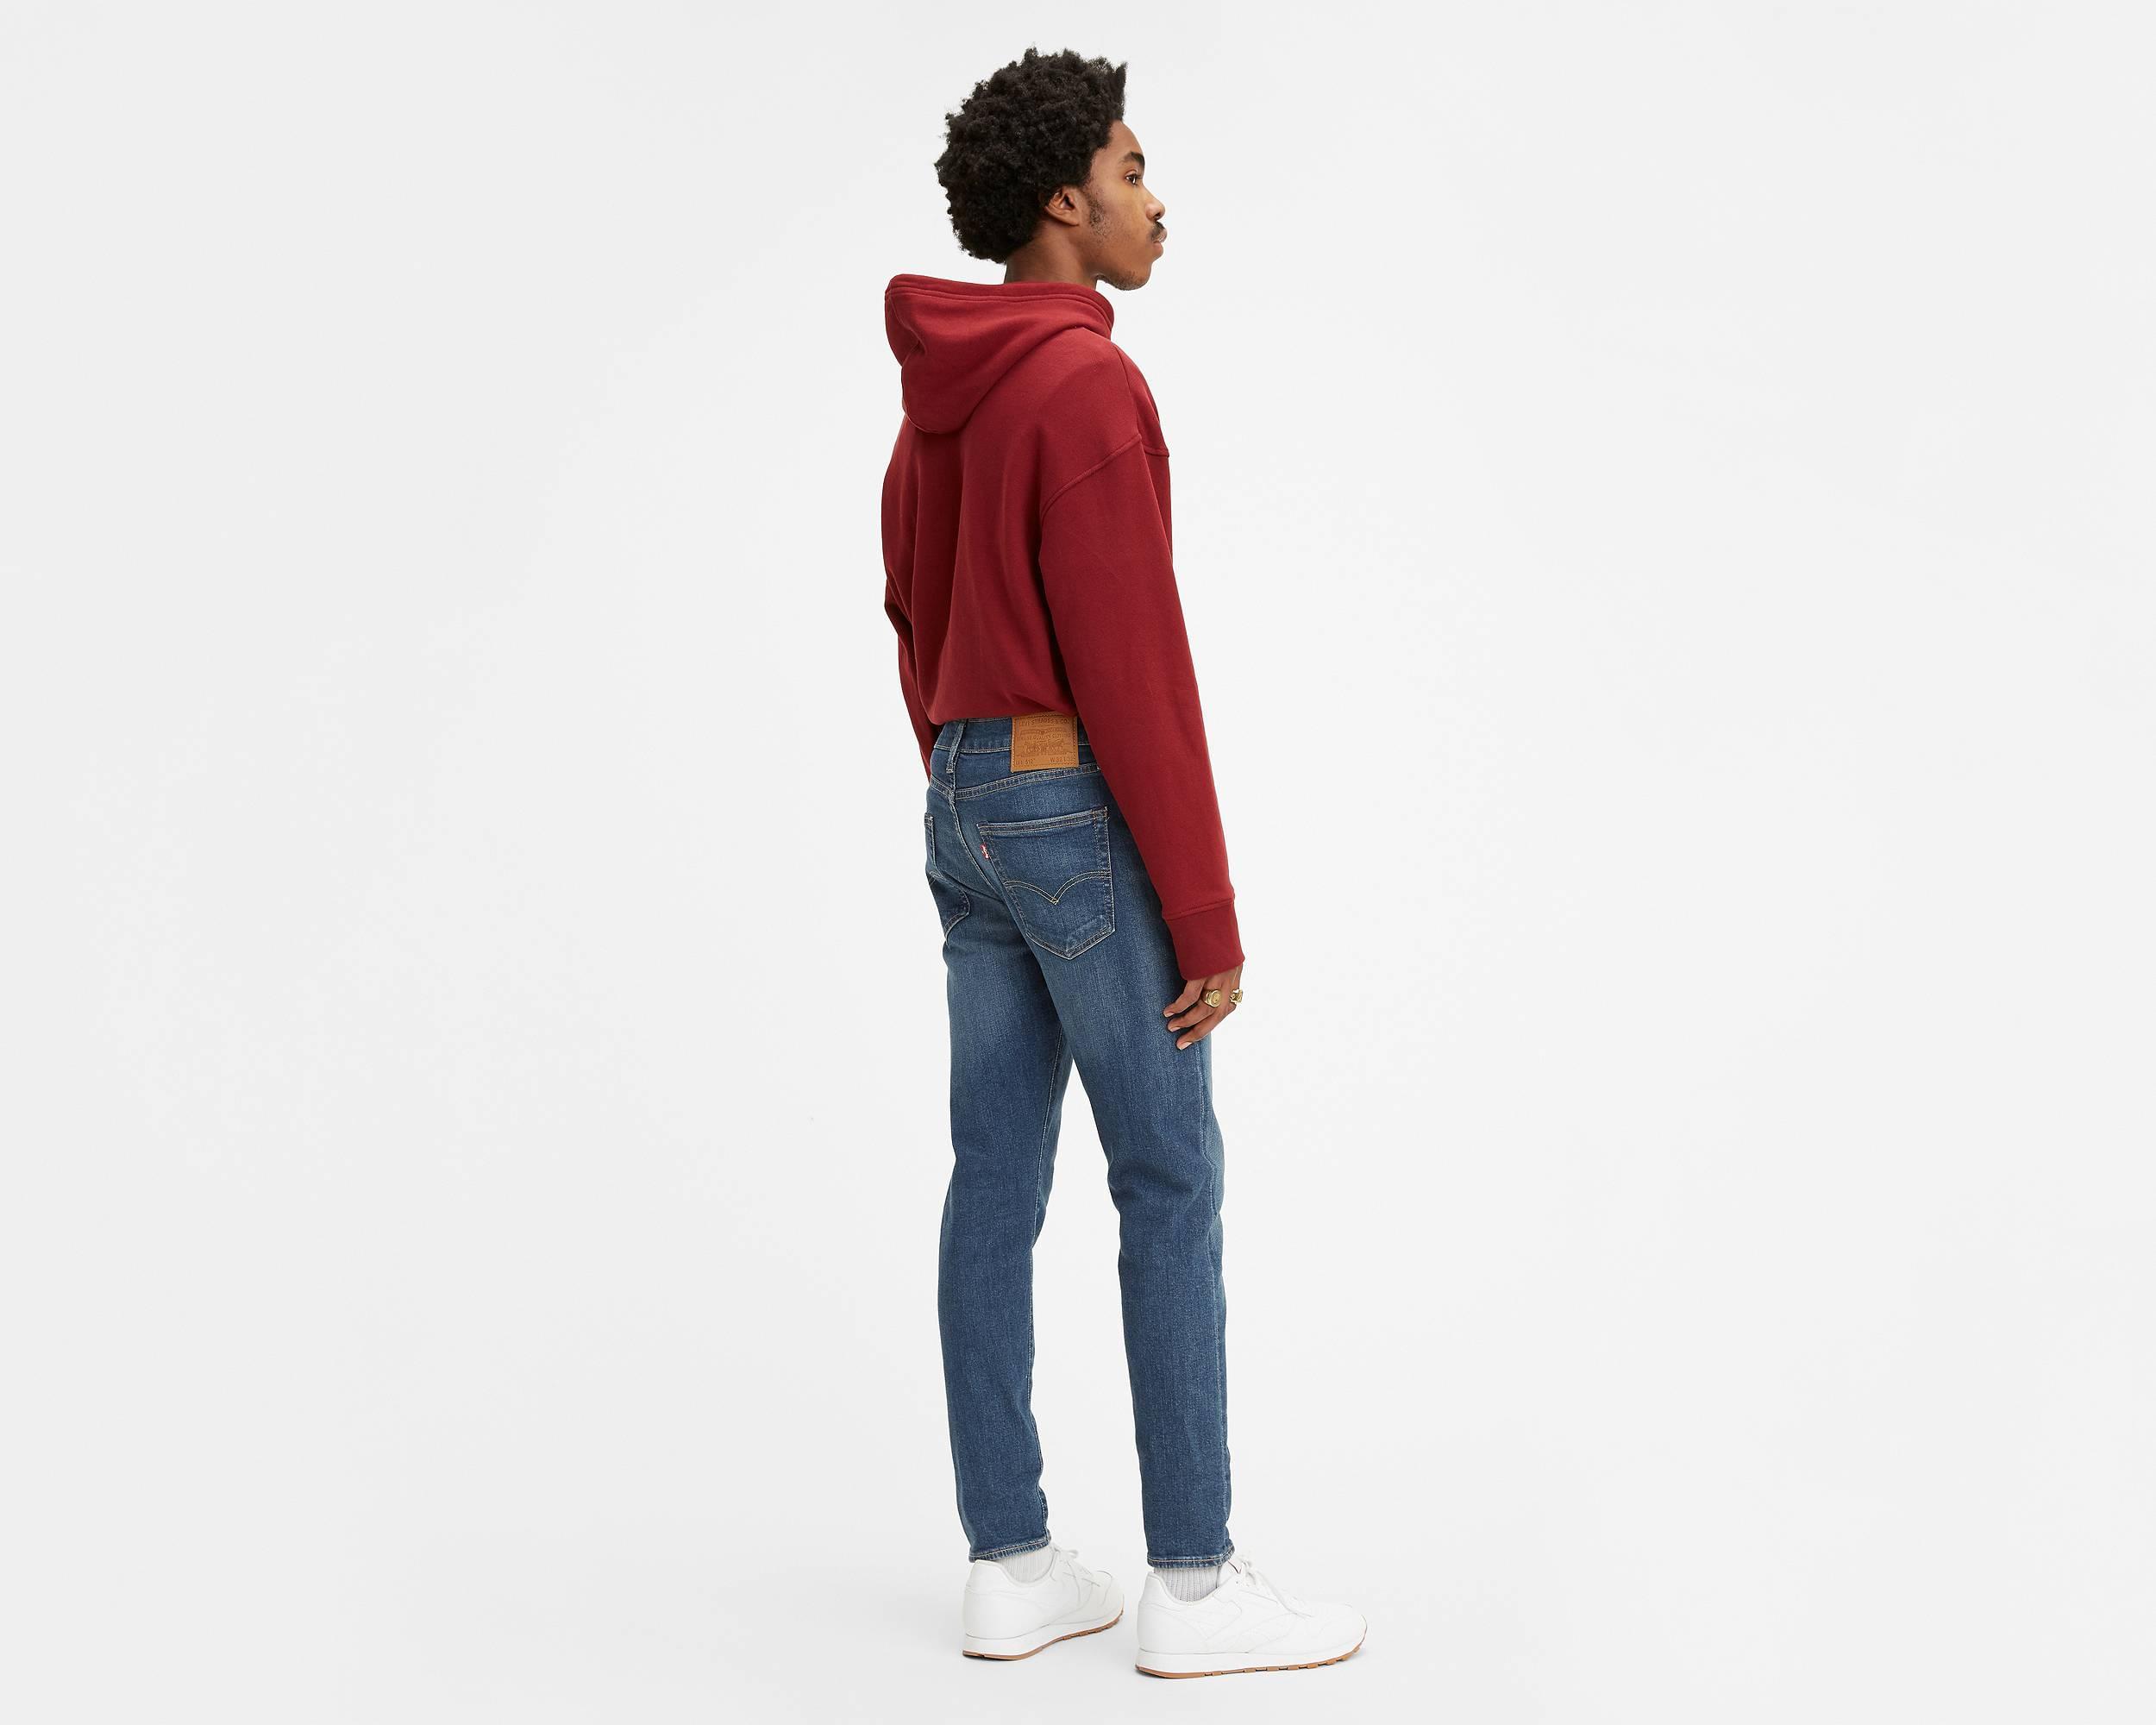 lee cintura elástica jeans mens